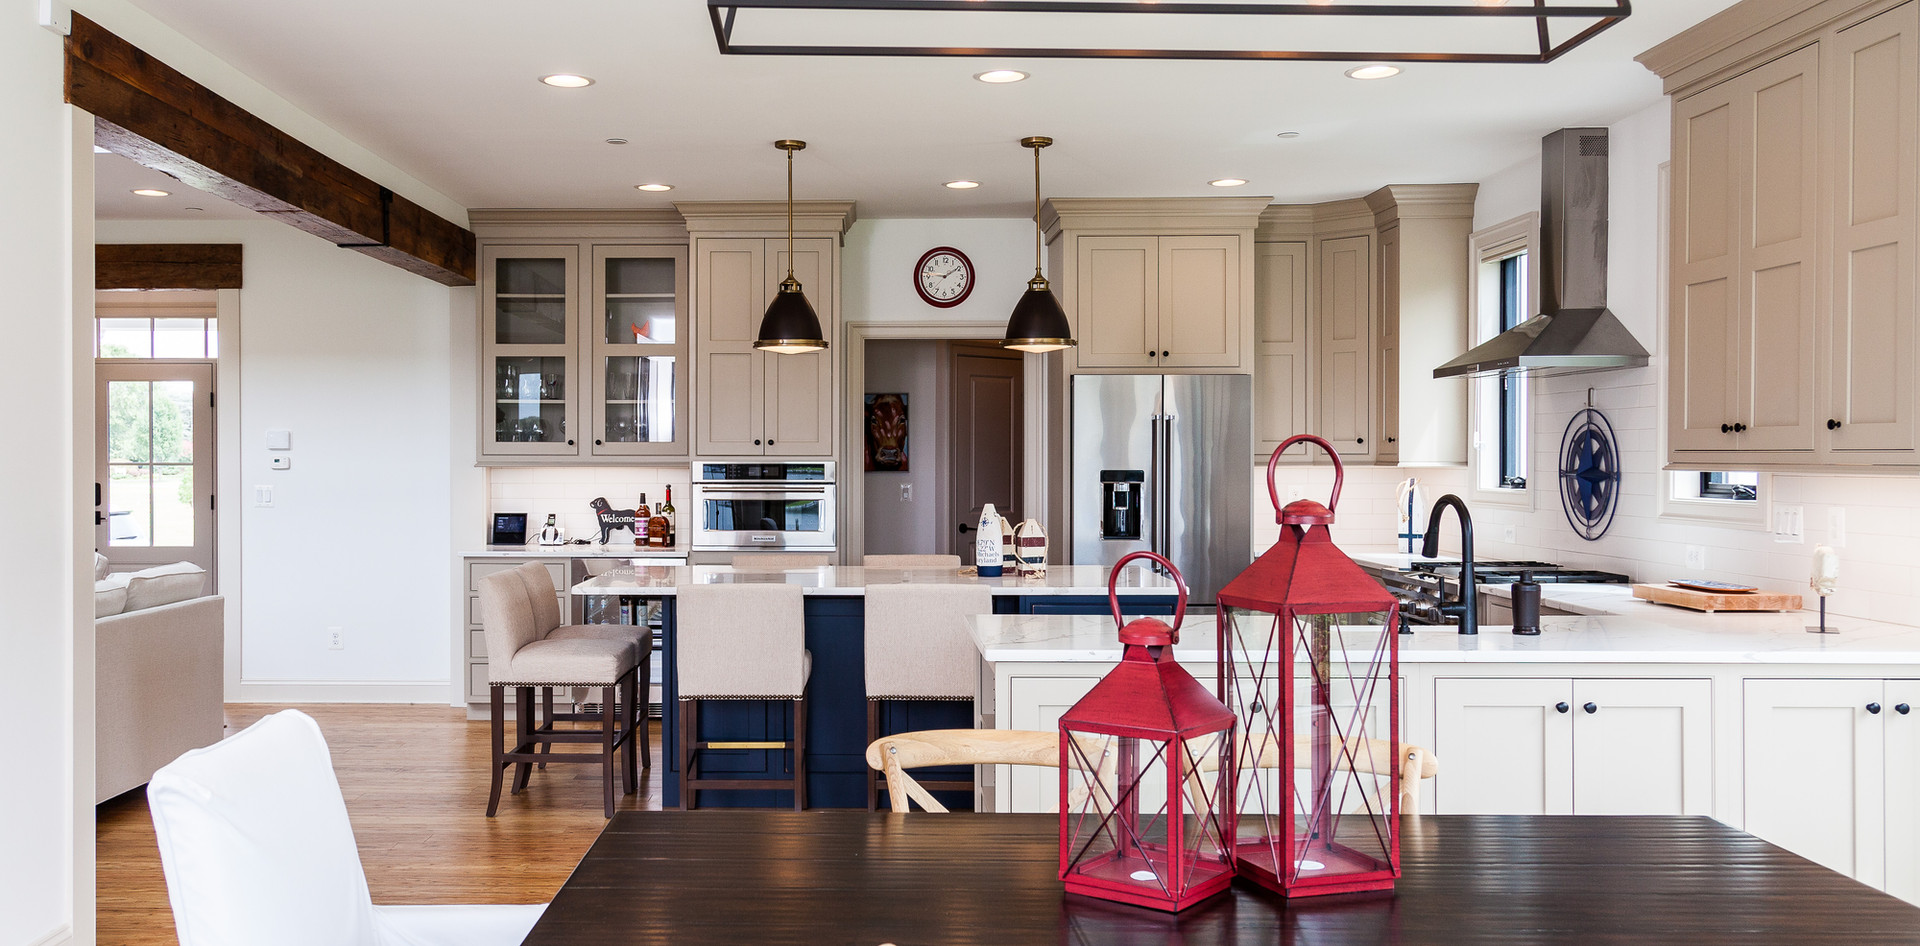 Martingham Kitchen Design 2